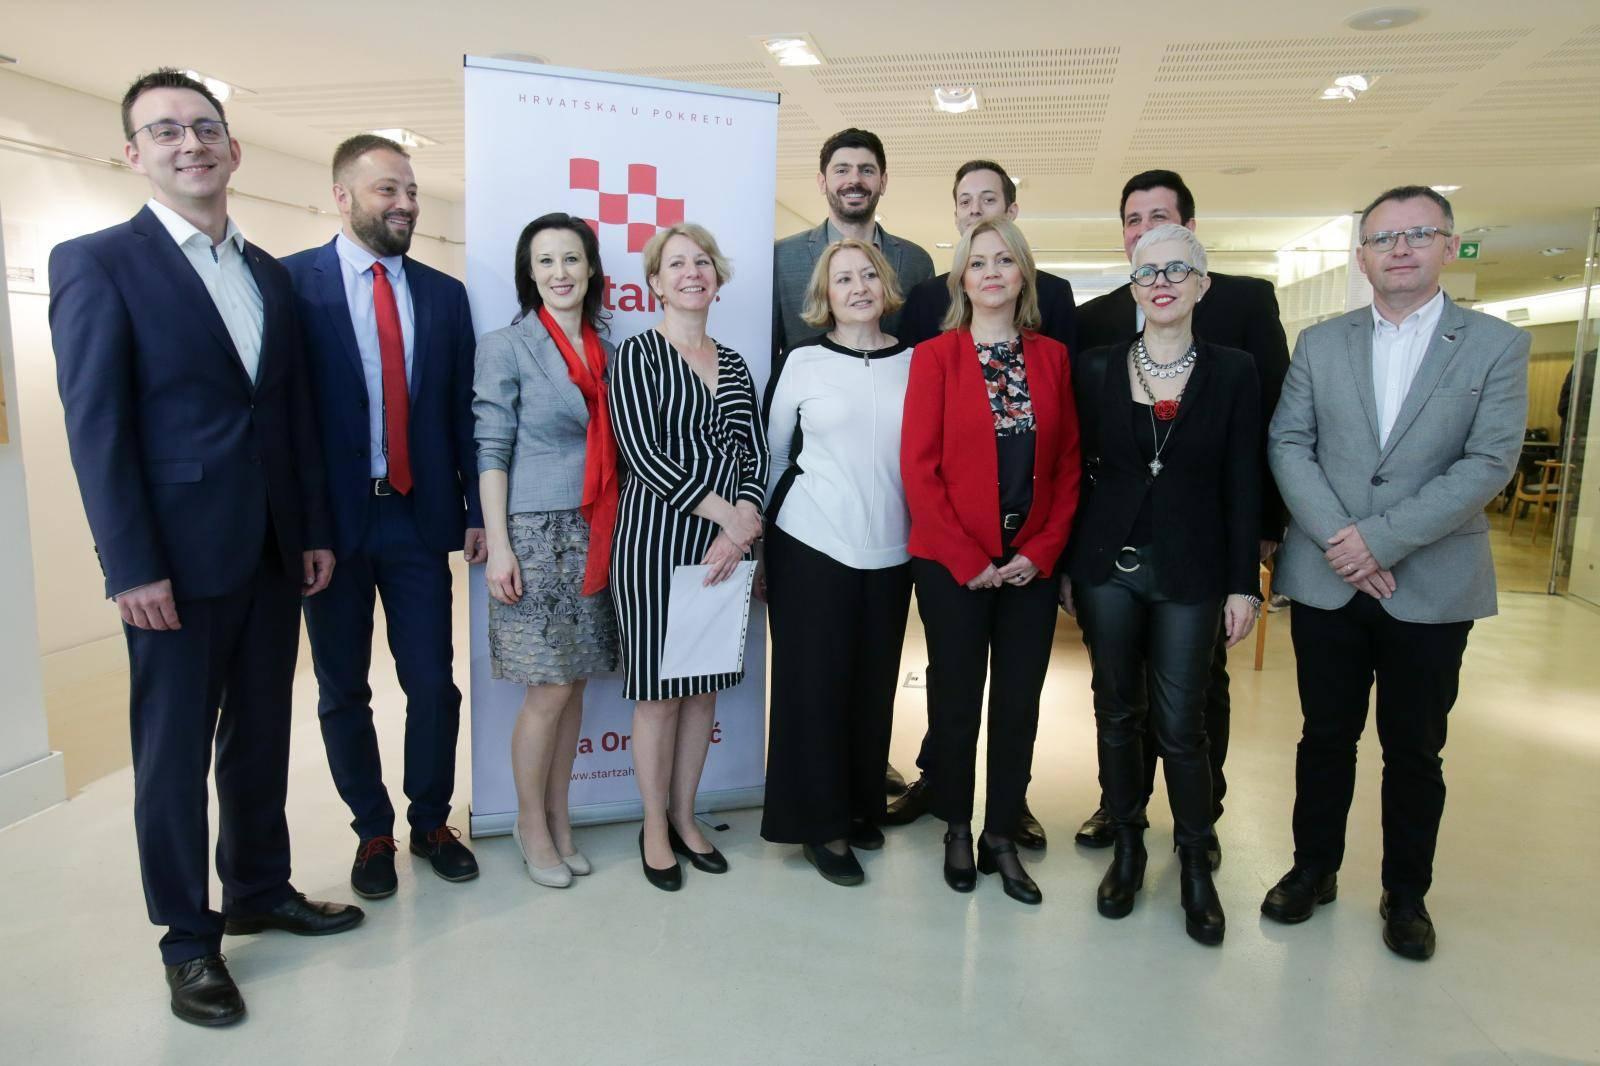 Zagreb:  Predstavljanje liste kandidata stranke Start za izbore Europskog parlamenta